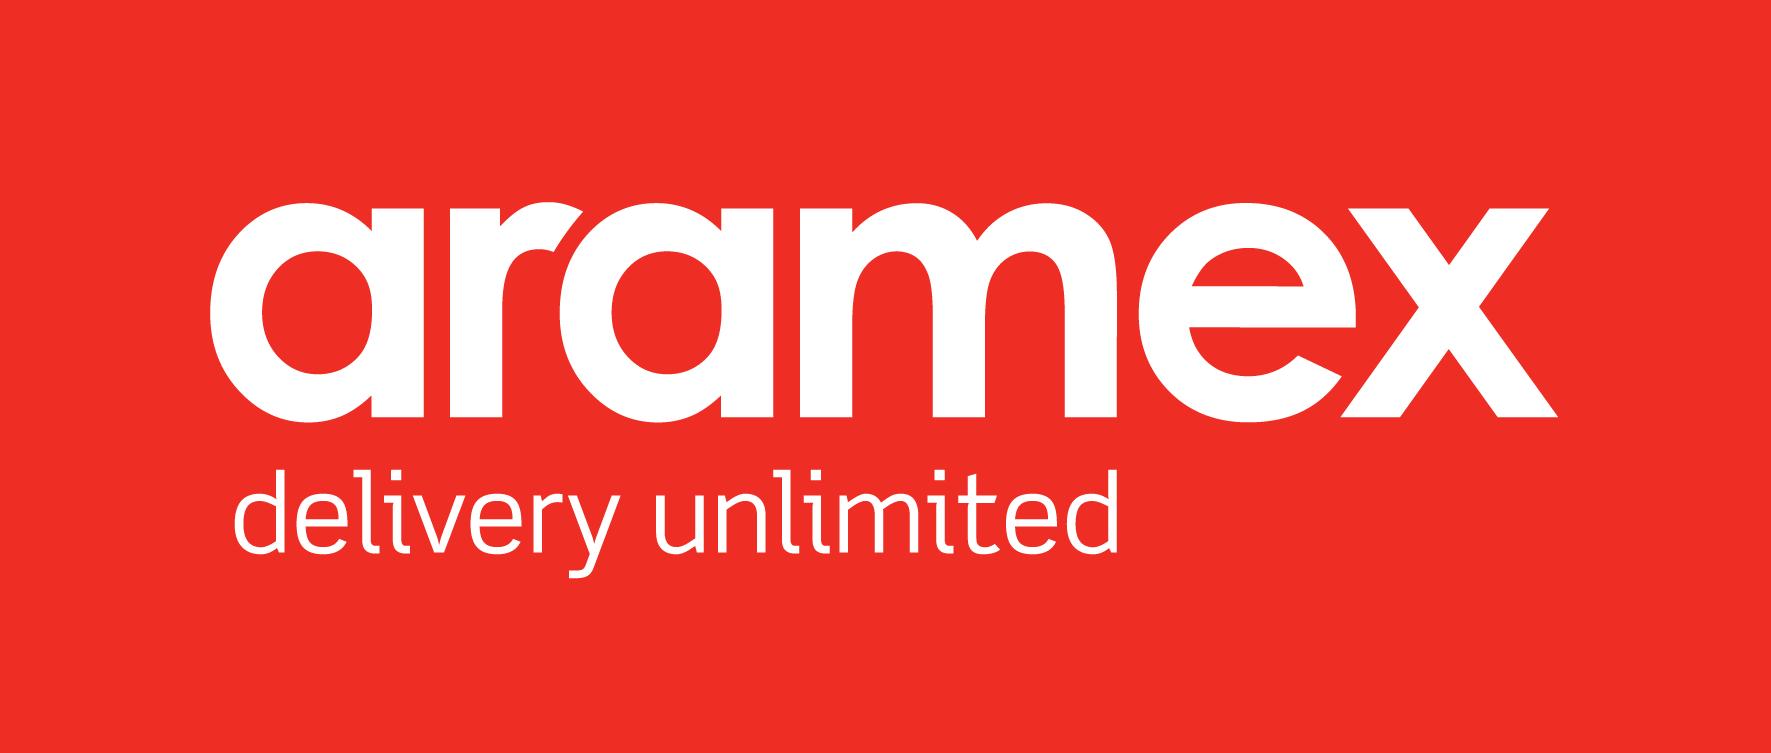 dd16d0548 كيفية الإشتراك في أرامكس شوب اند شيب Aramex Shop&Ship